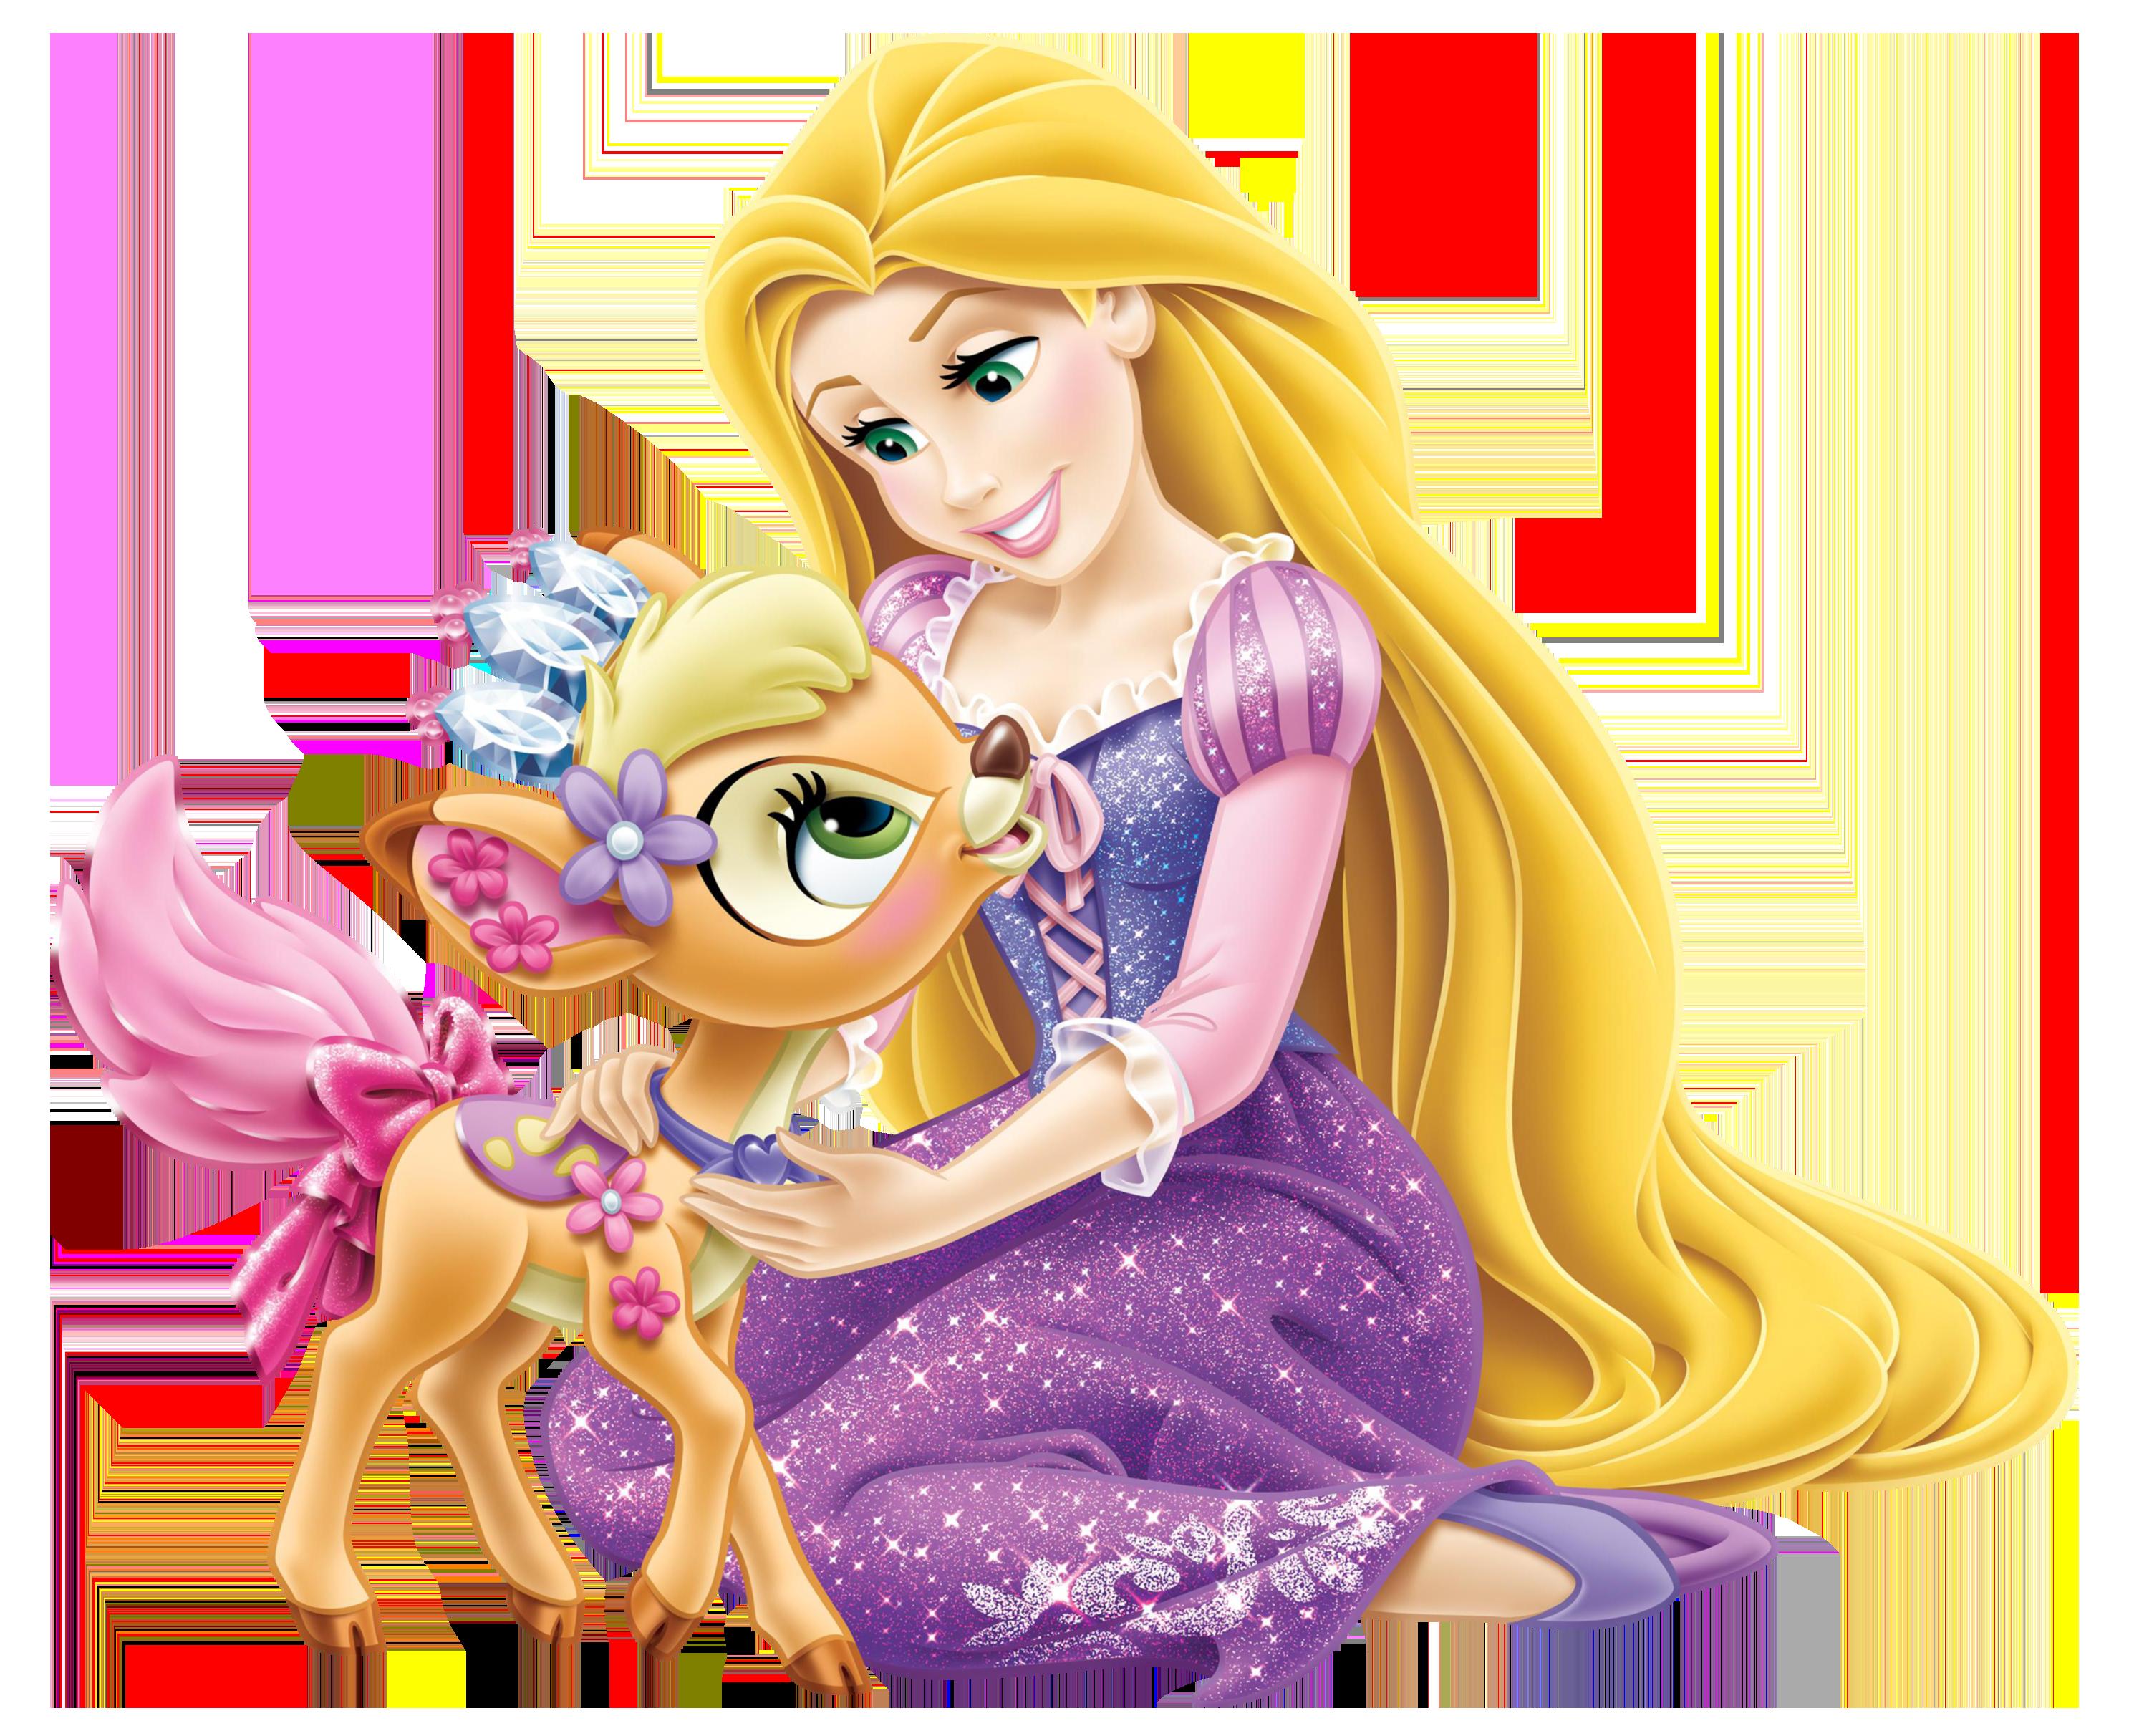 Disney princess christmas clipart clip library library Disney Princess Rapunzel with Little Deer Transparent PNG Clip Art ... clip library library